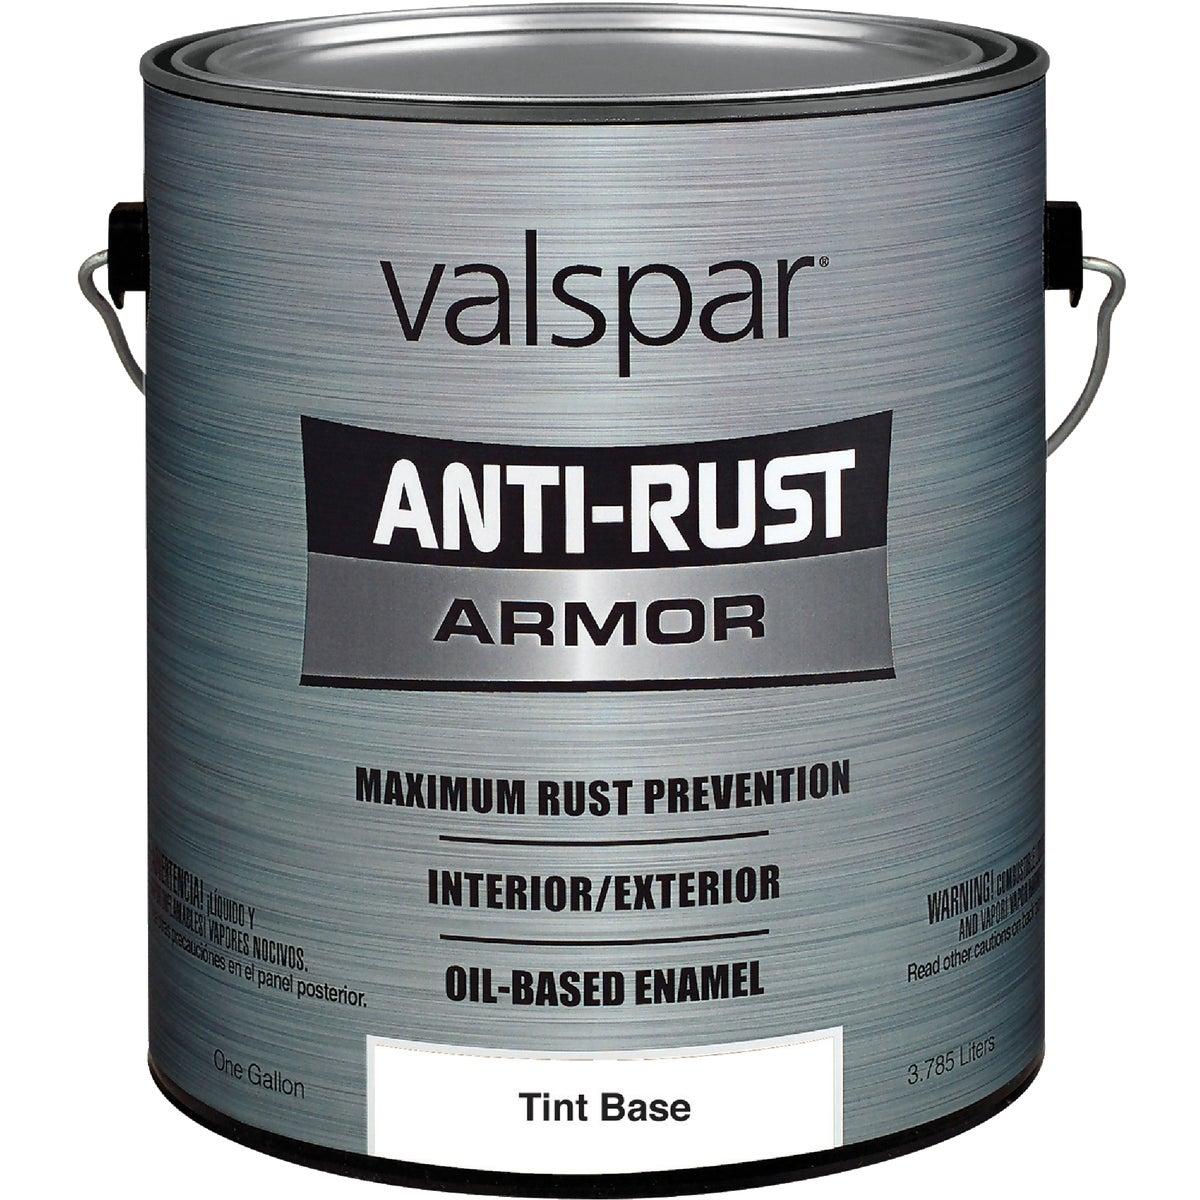 GLS TINT BS RUST ENAMEL - 044.0021811.007 by Valspar Corp